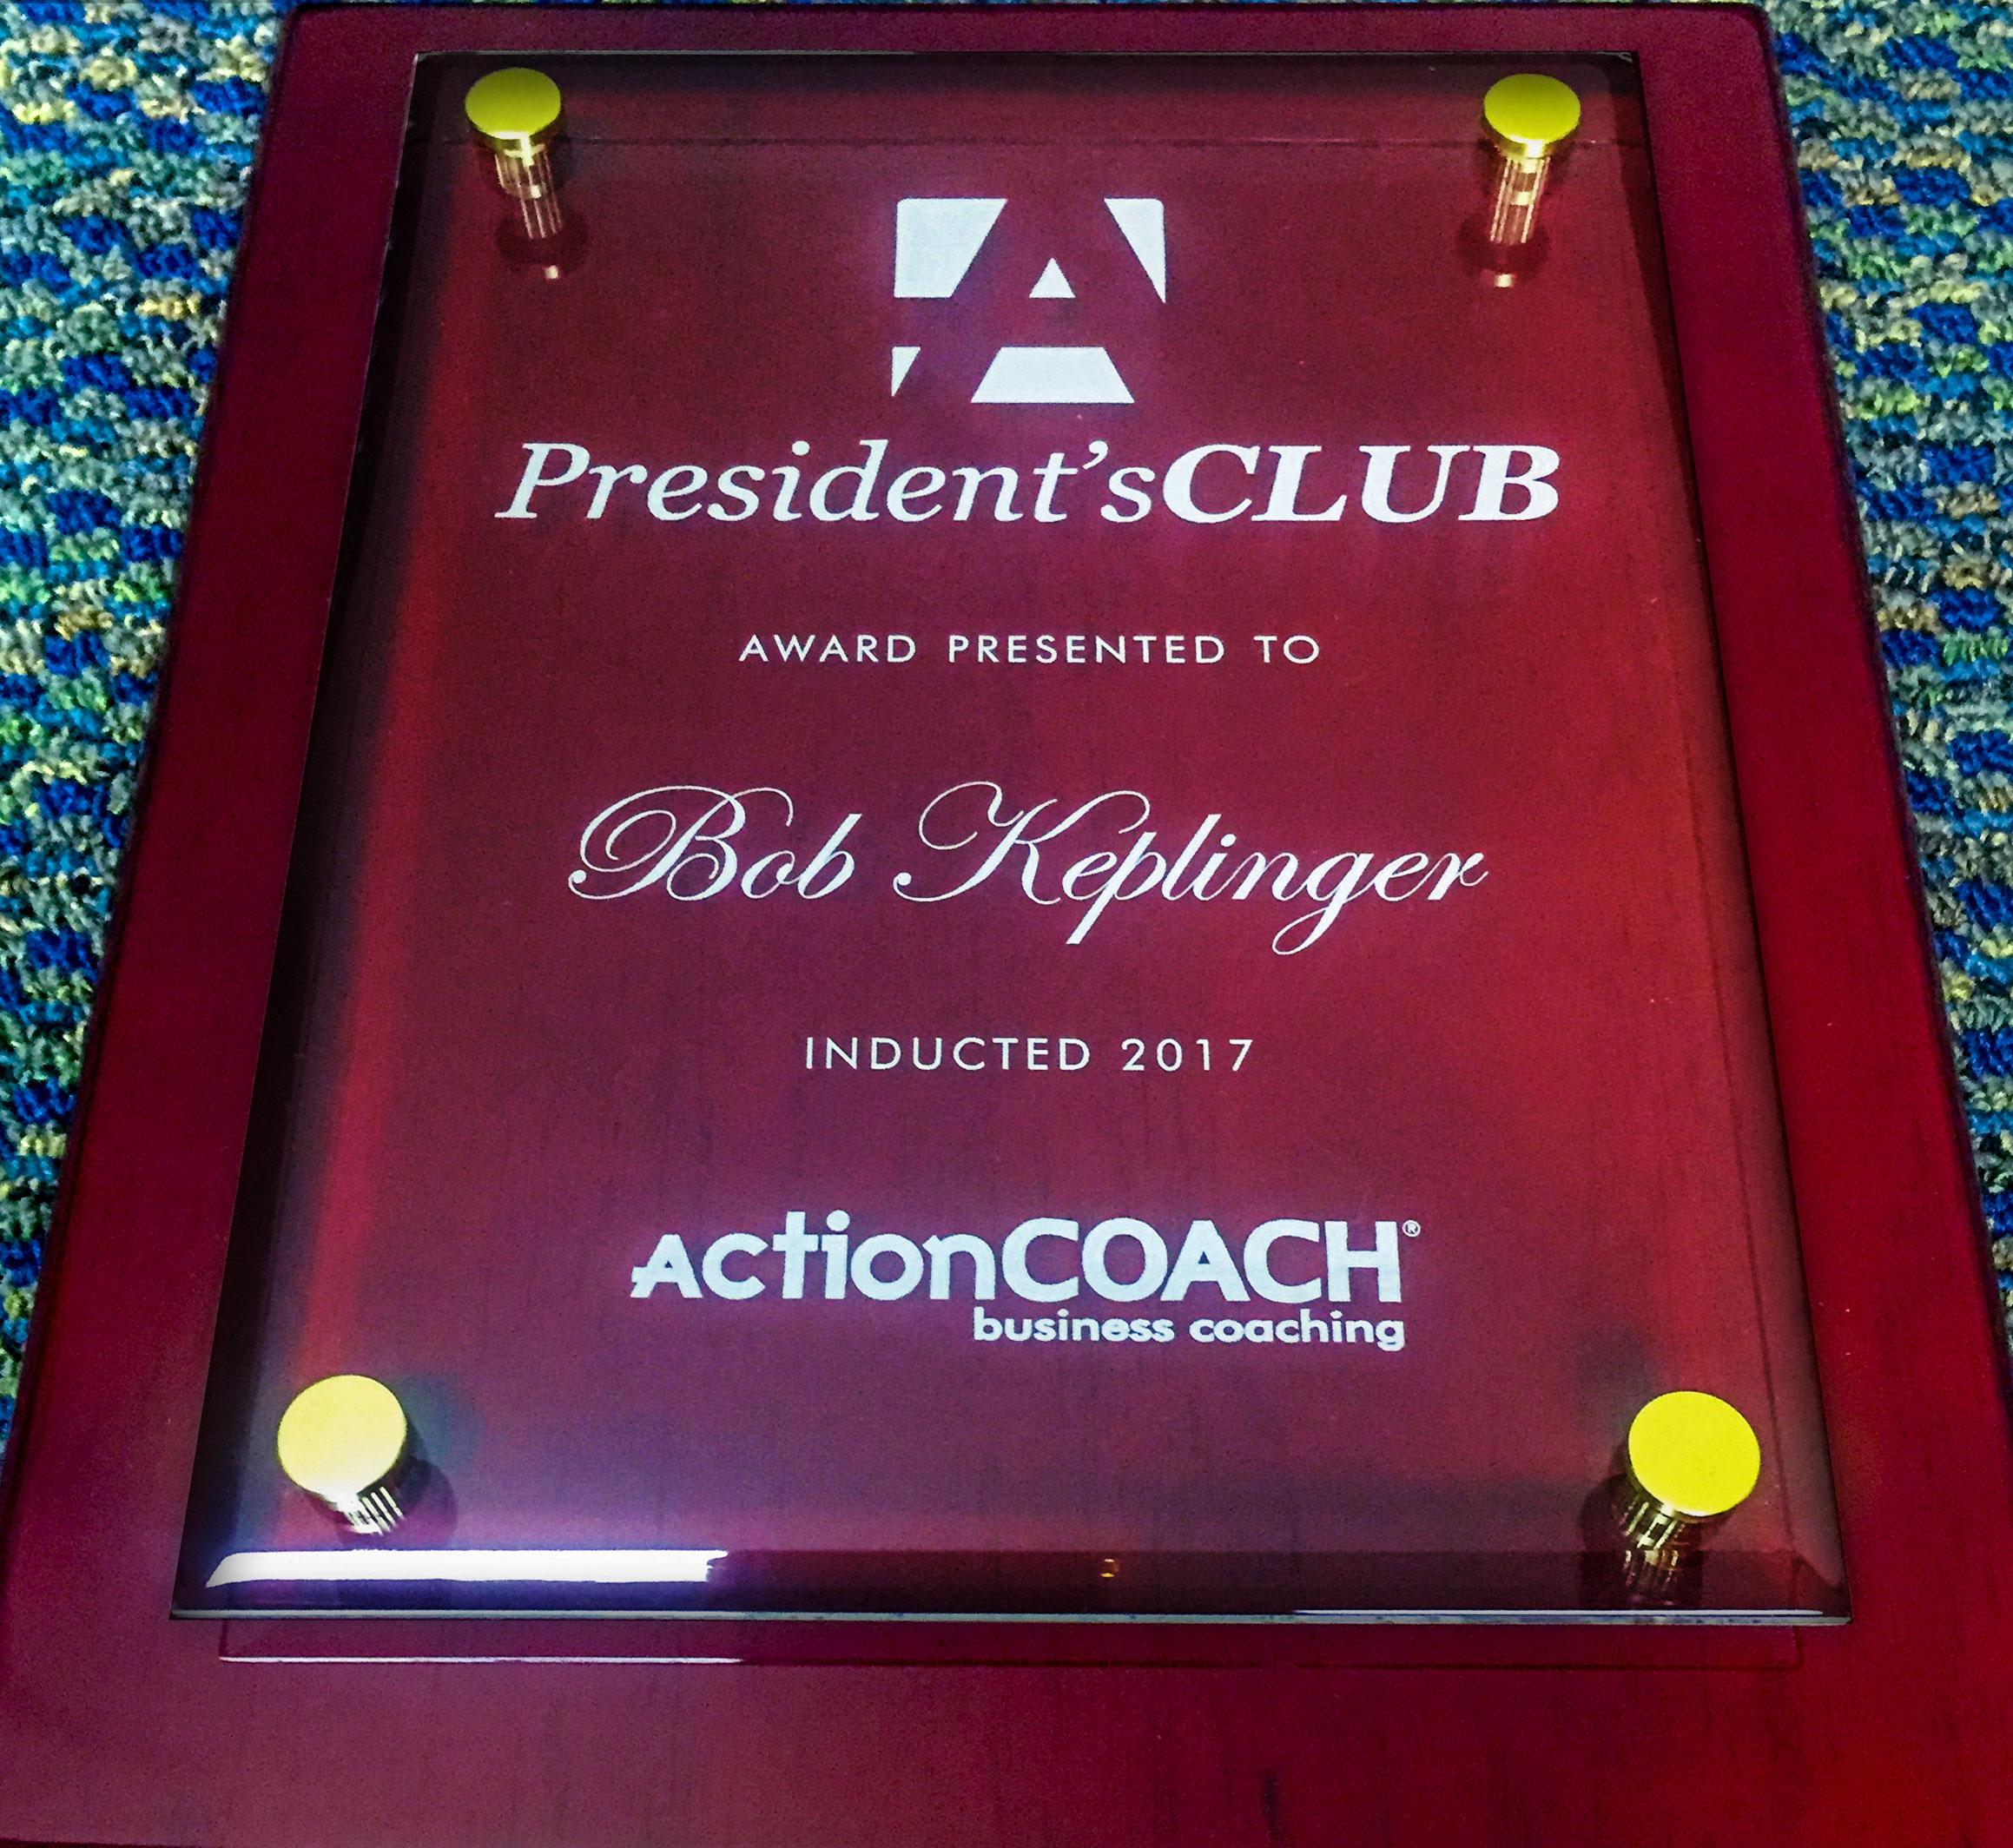 Executive Business Coach, Bob Keplinger